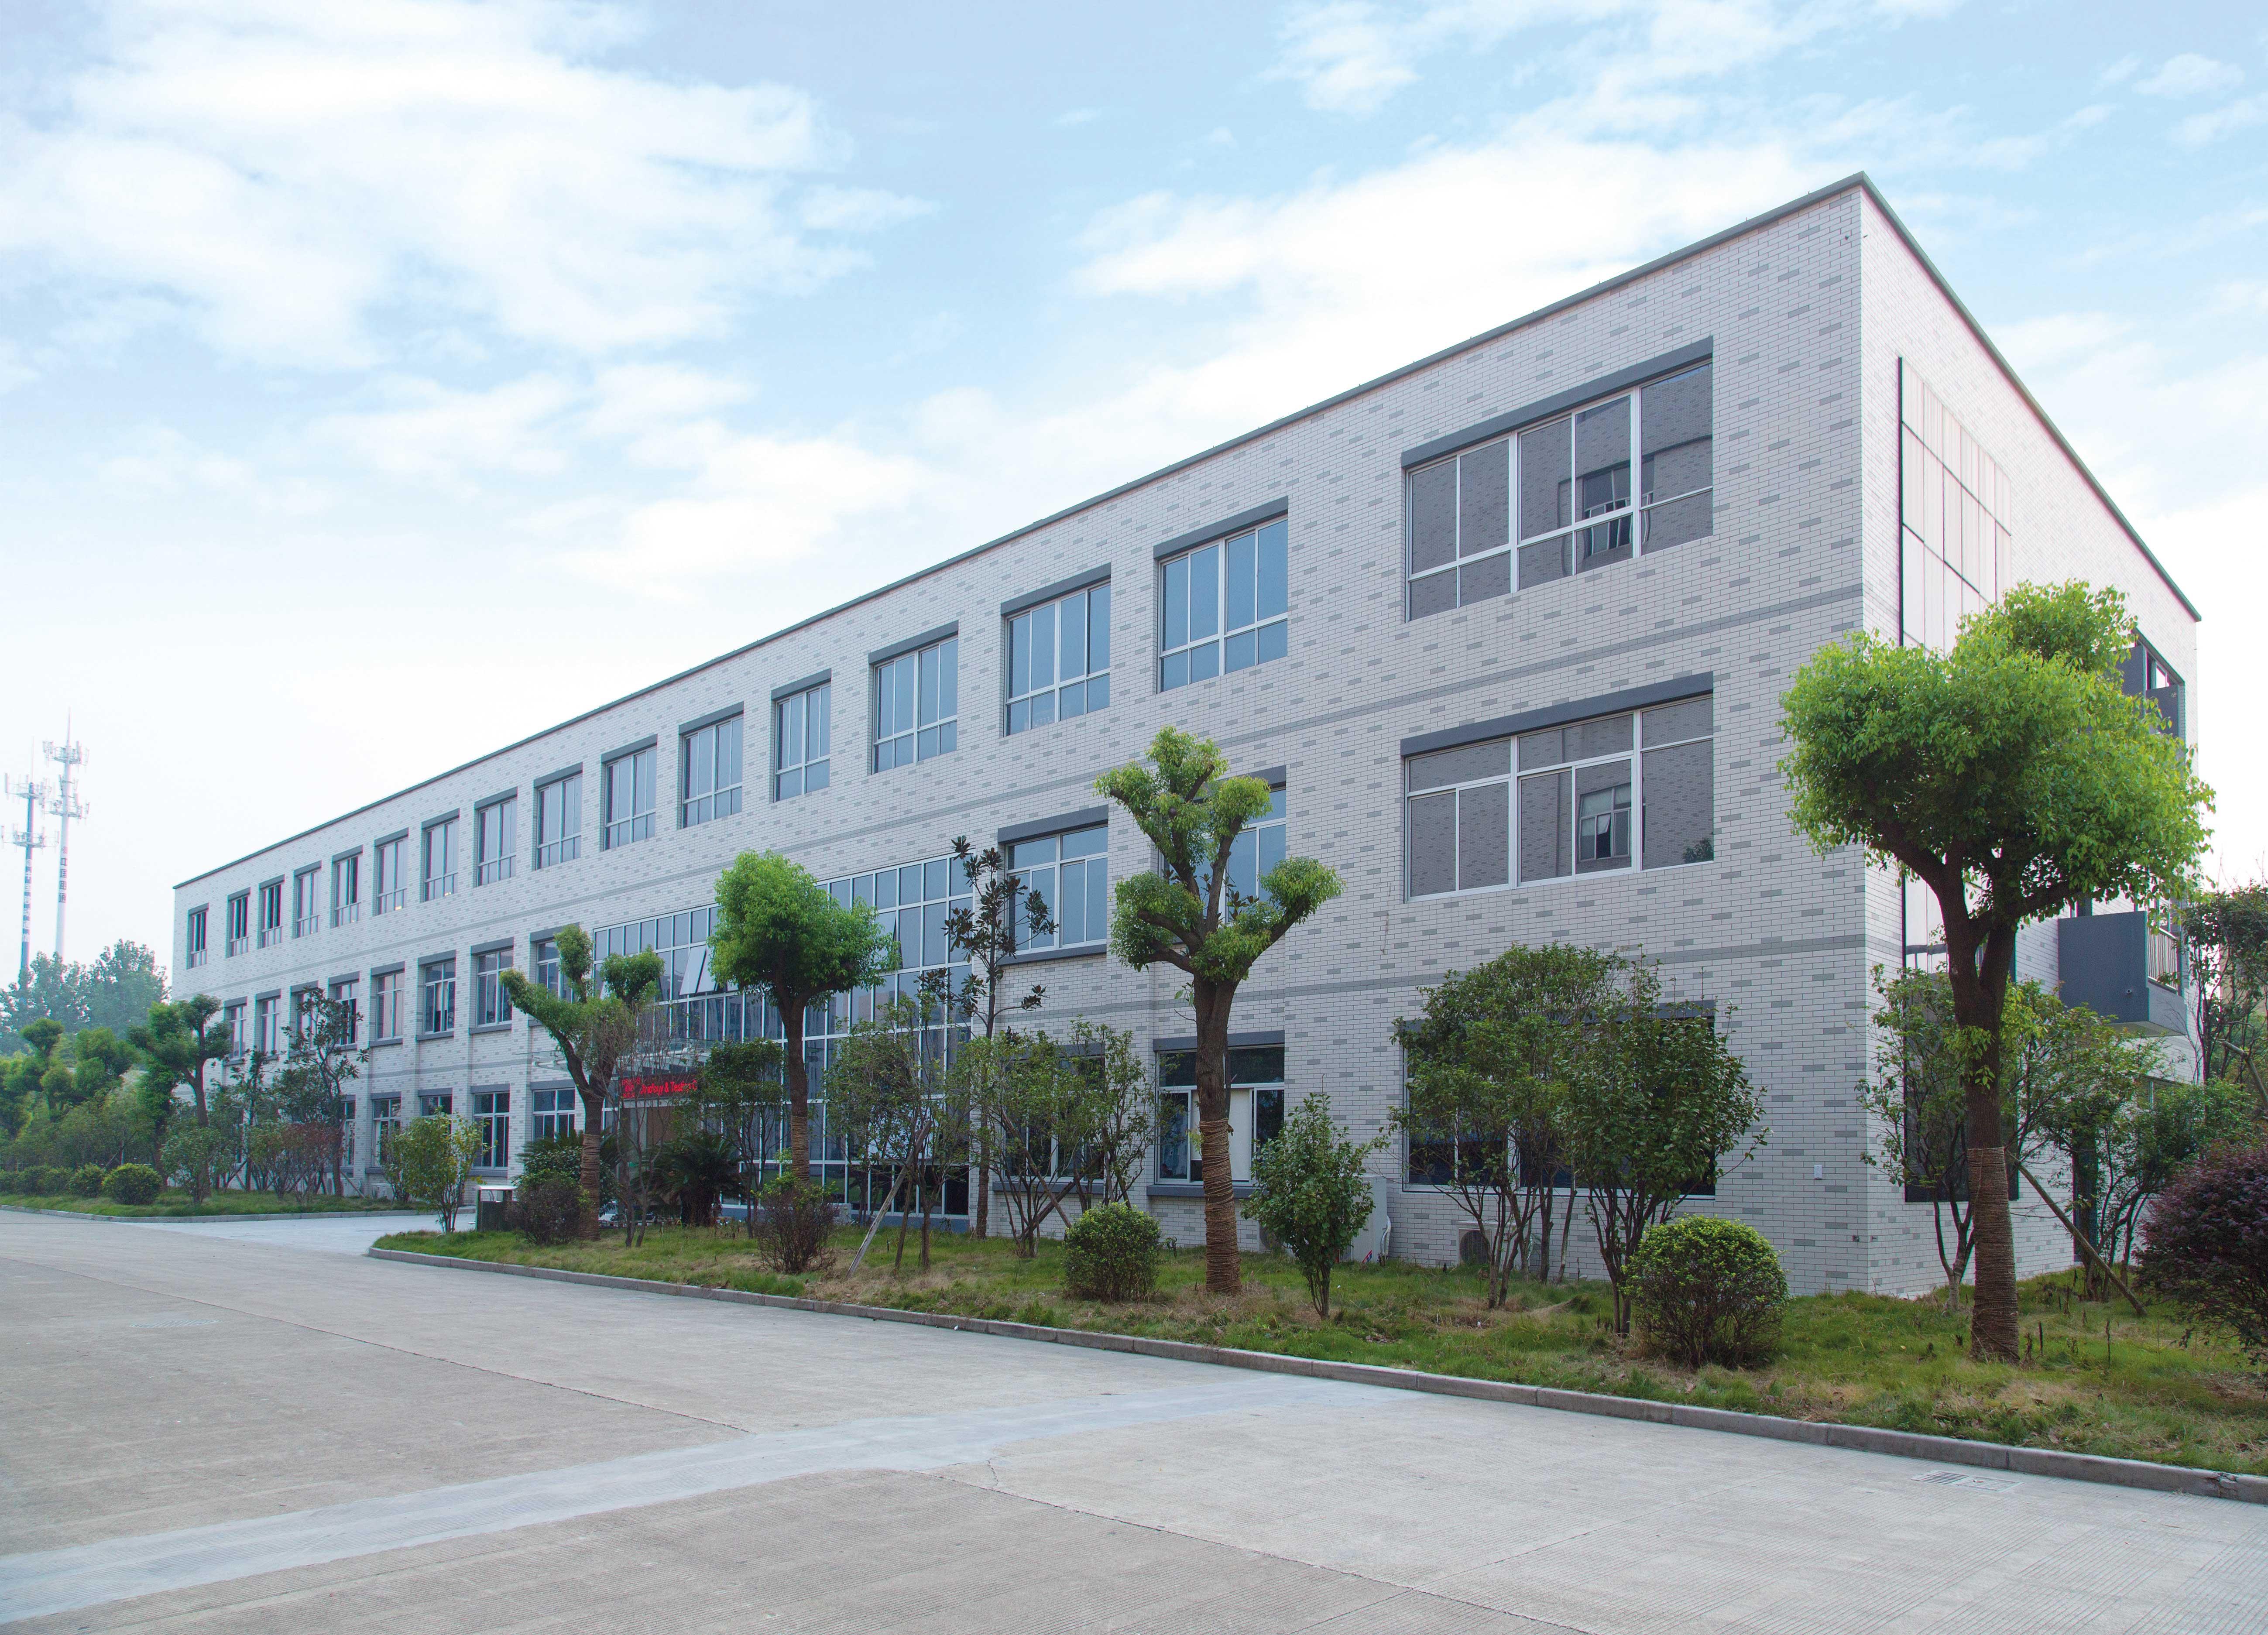 SX testing centre